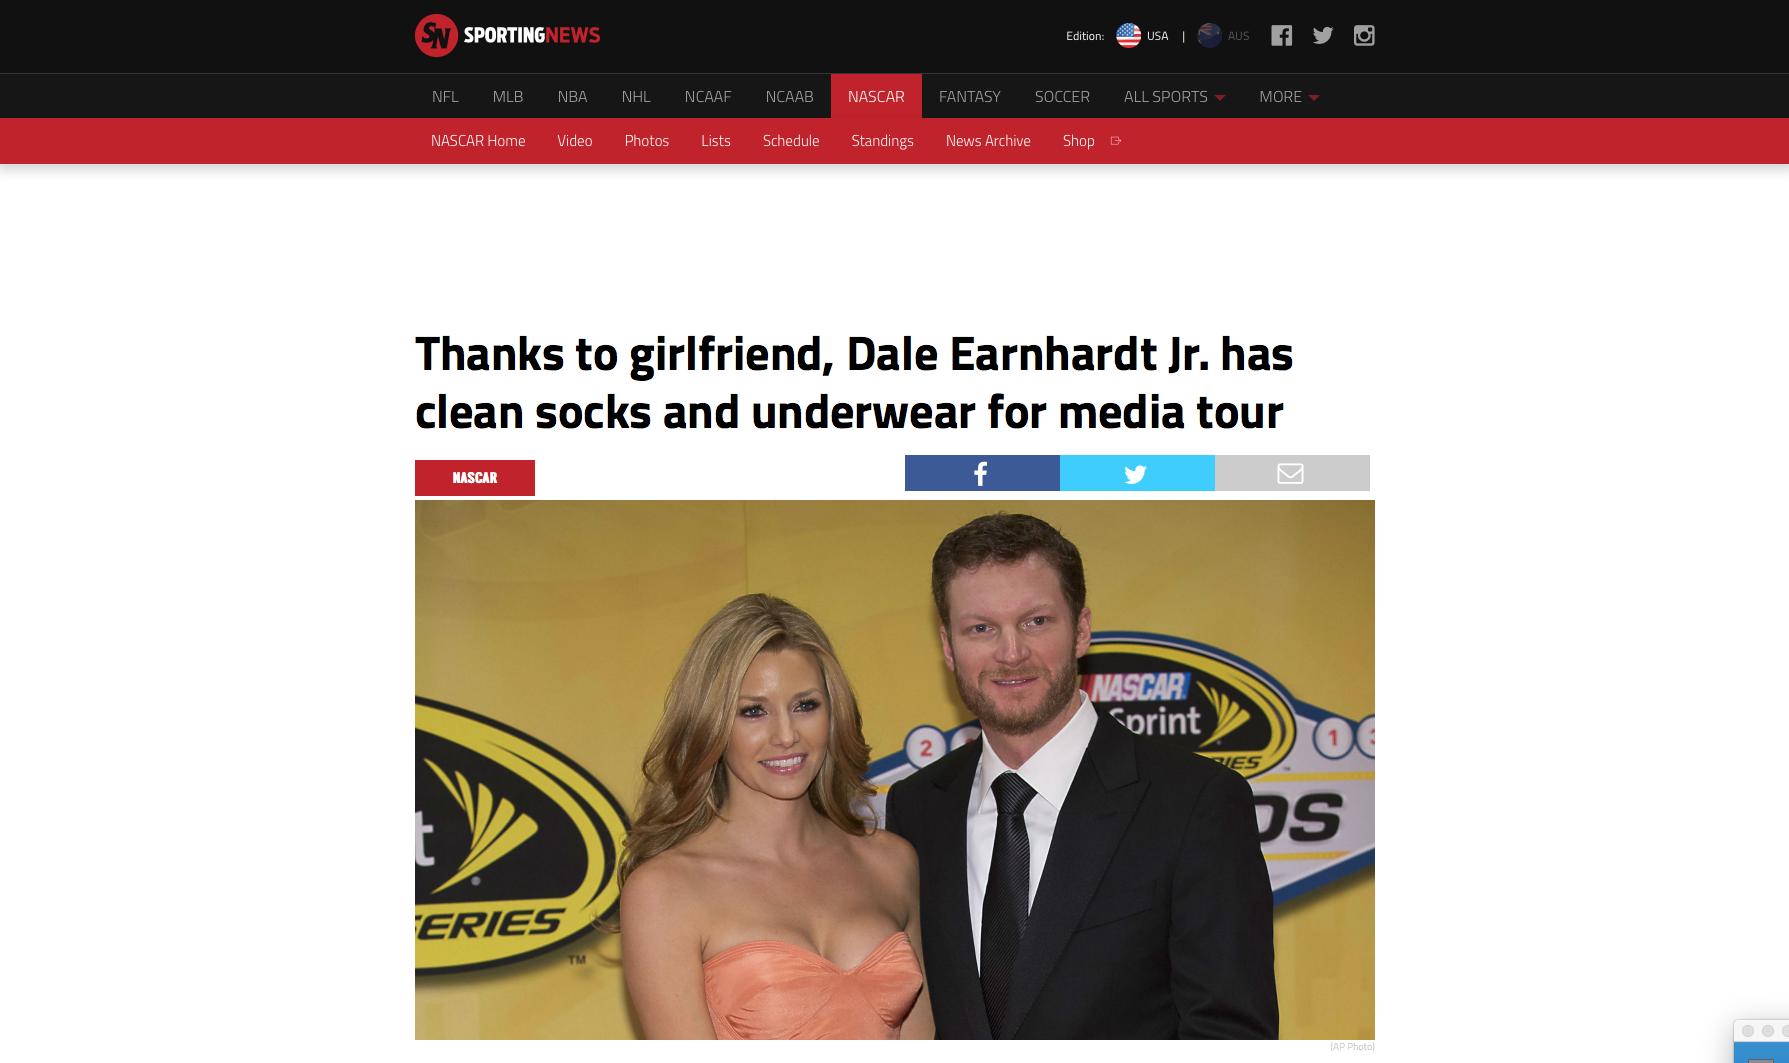 Sporting News | Kristin Heinrich